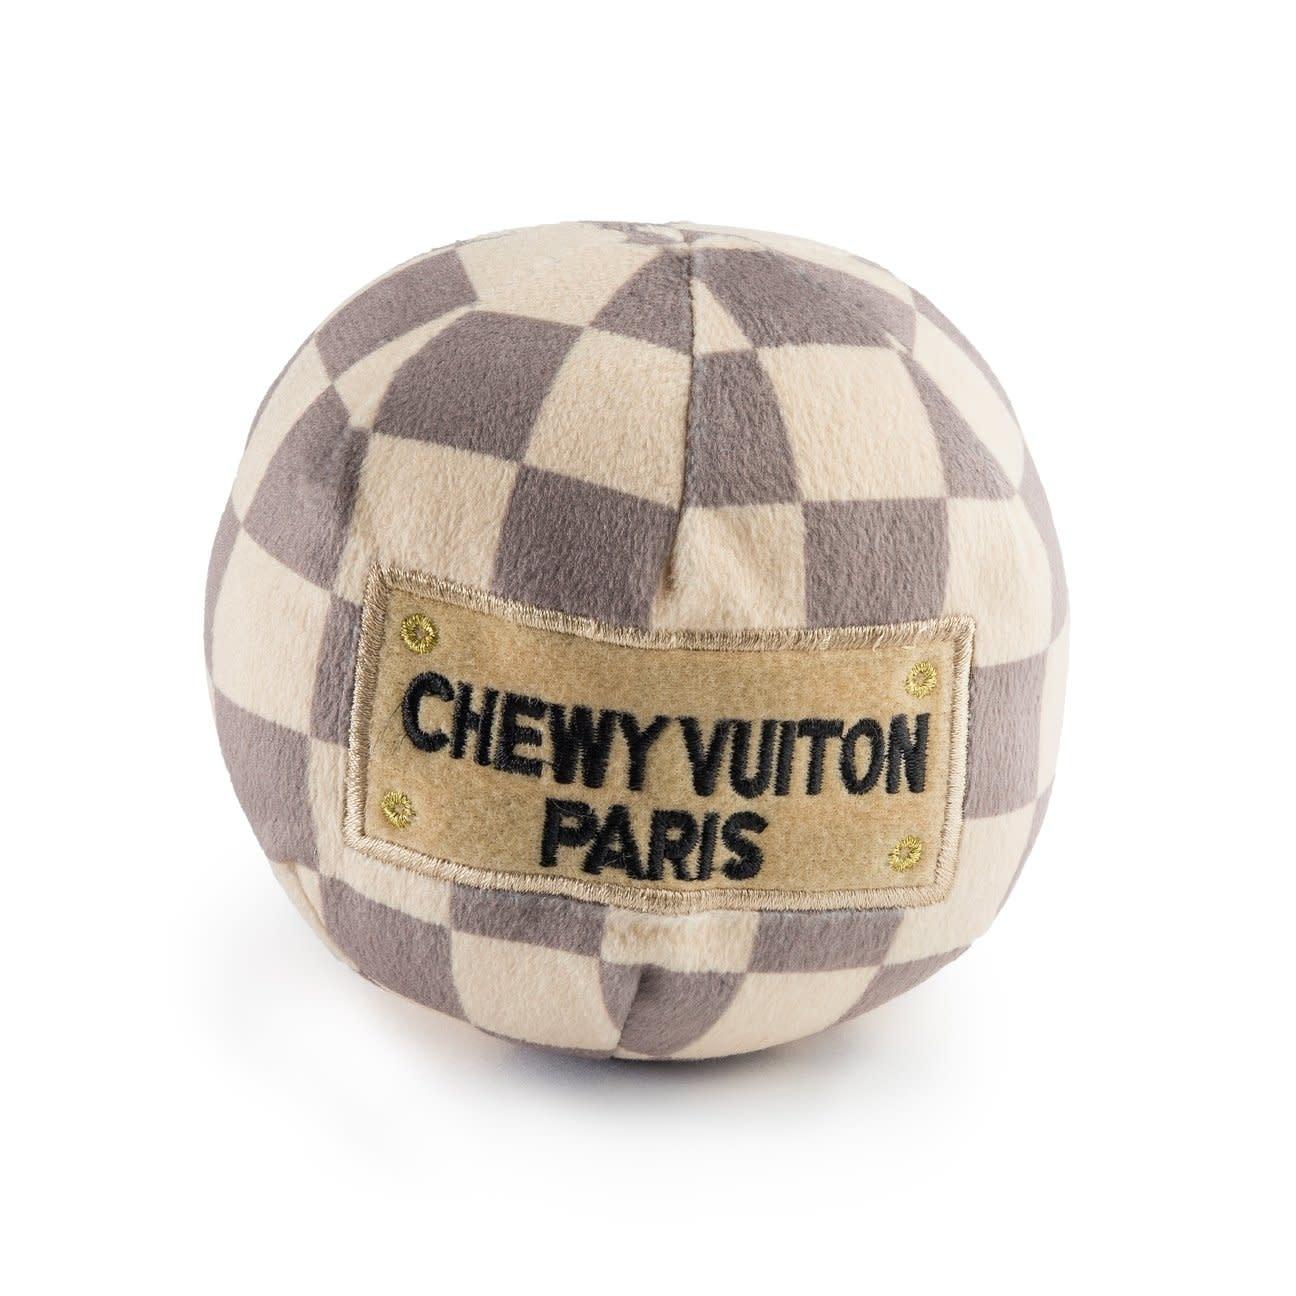 Chewy Vuiton Checker Ball LG